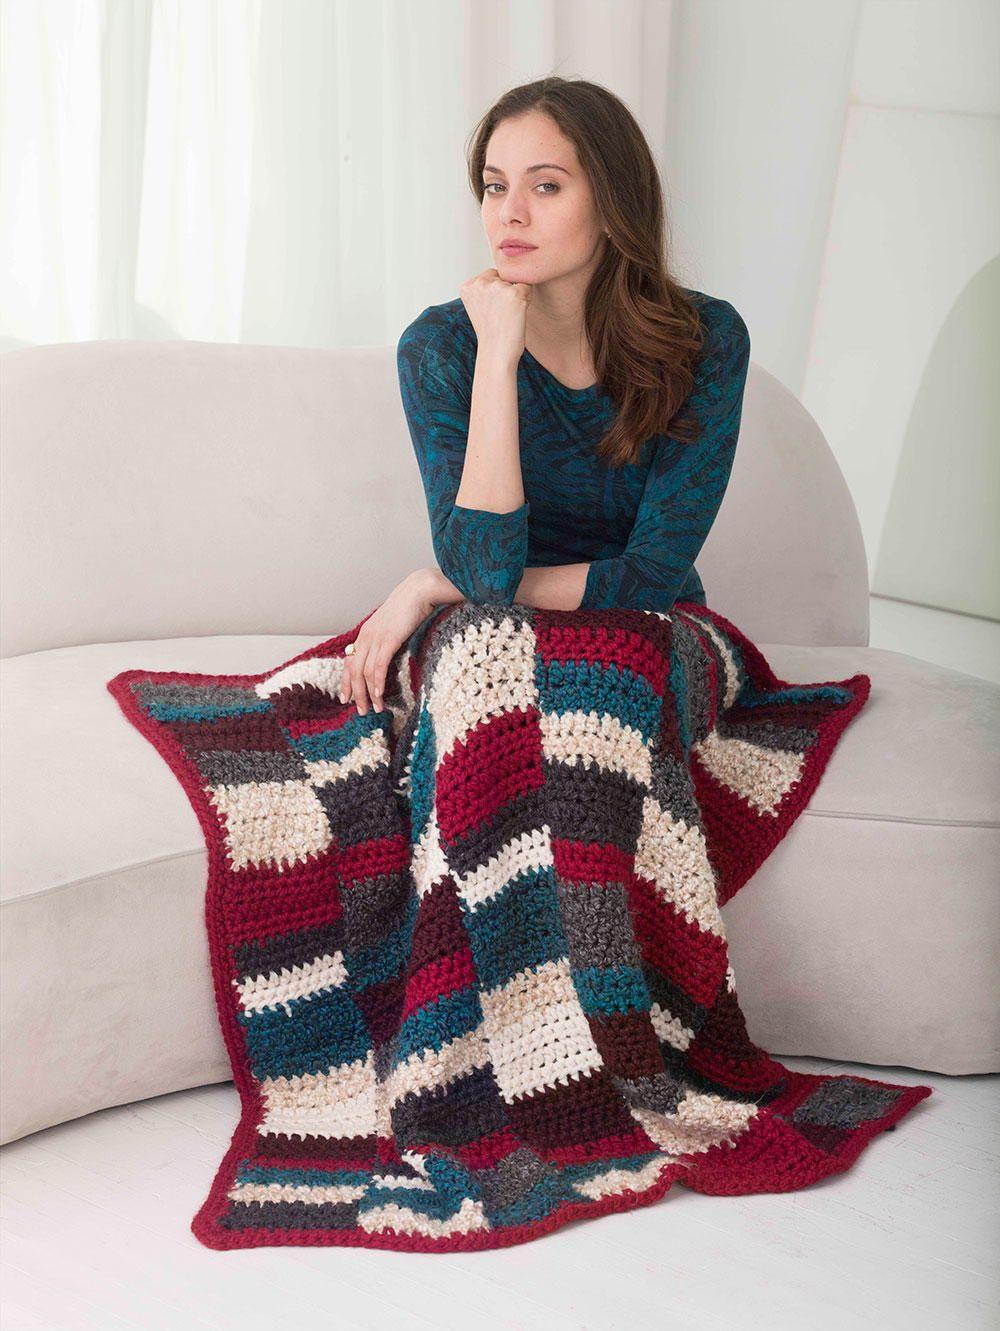 Comfy Heritage Quilt Crochet Blanket   Cobija, Tejido y Labores